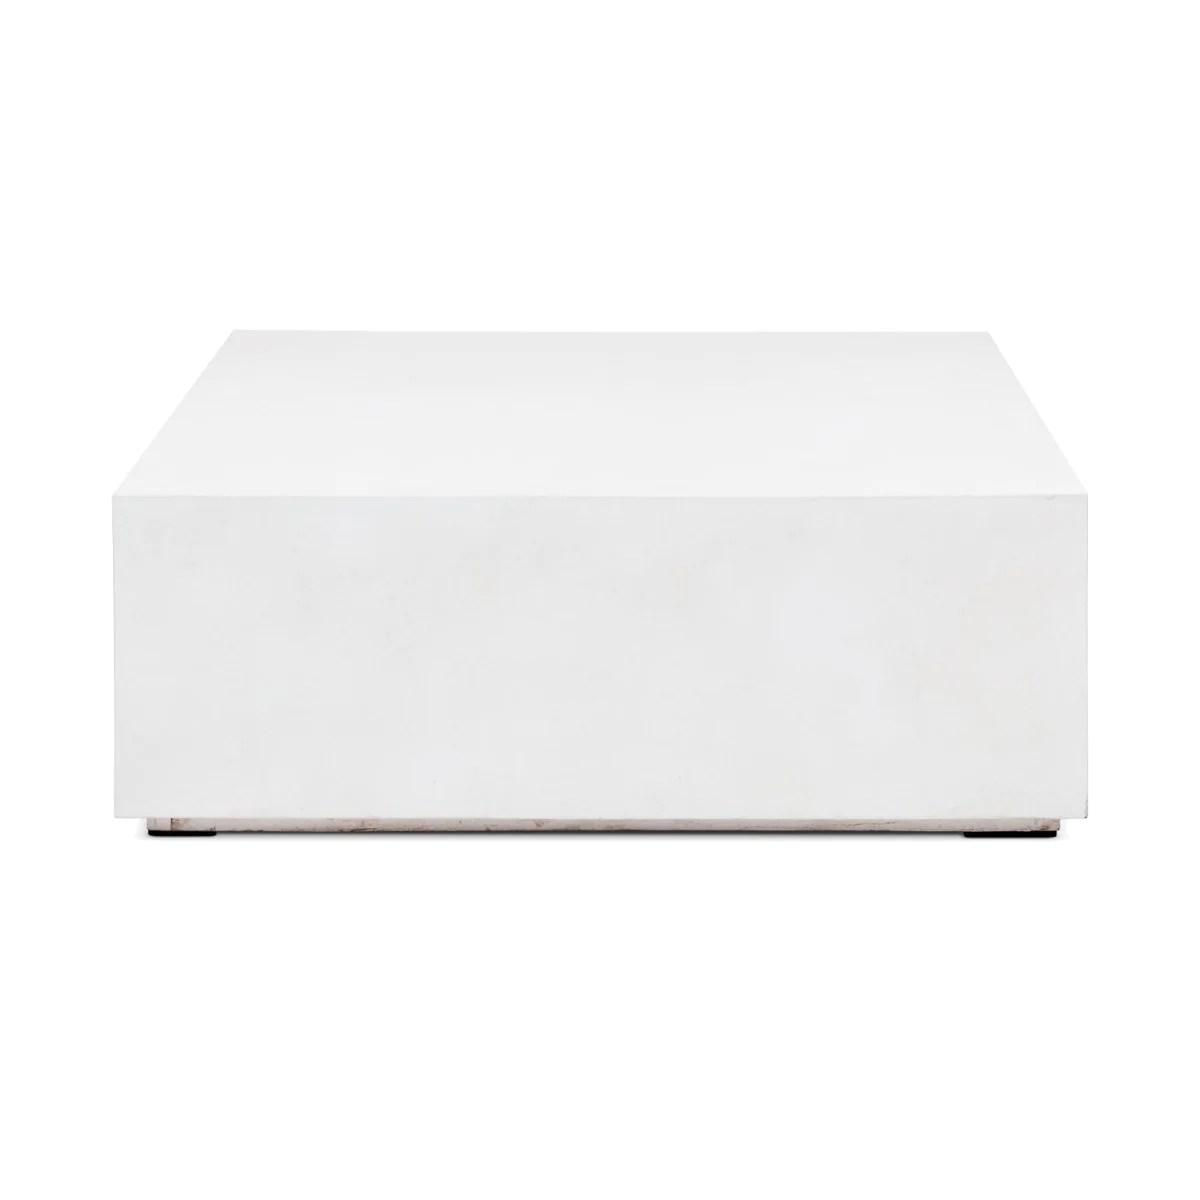 ivory white concrete square block coffee table